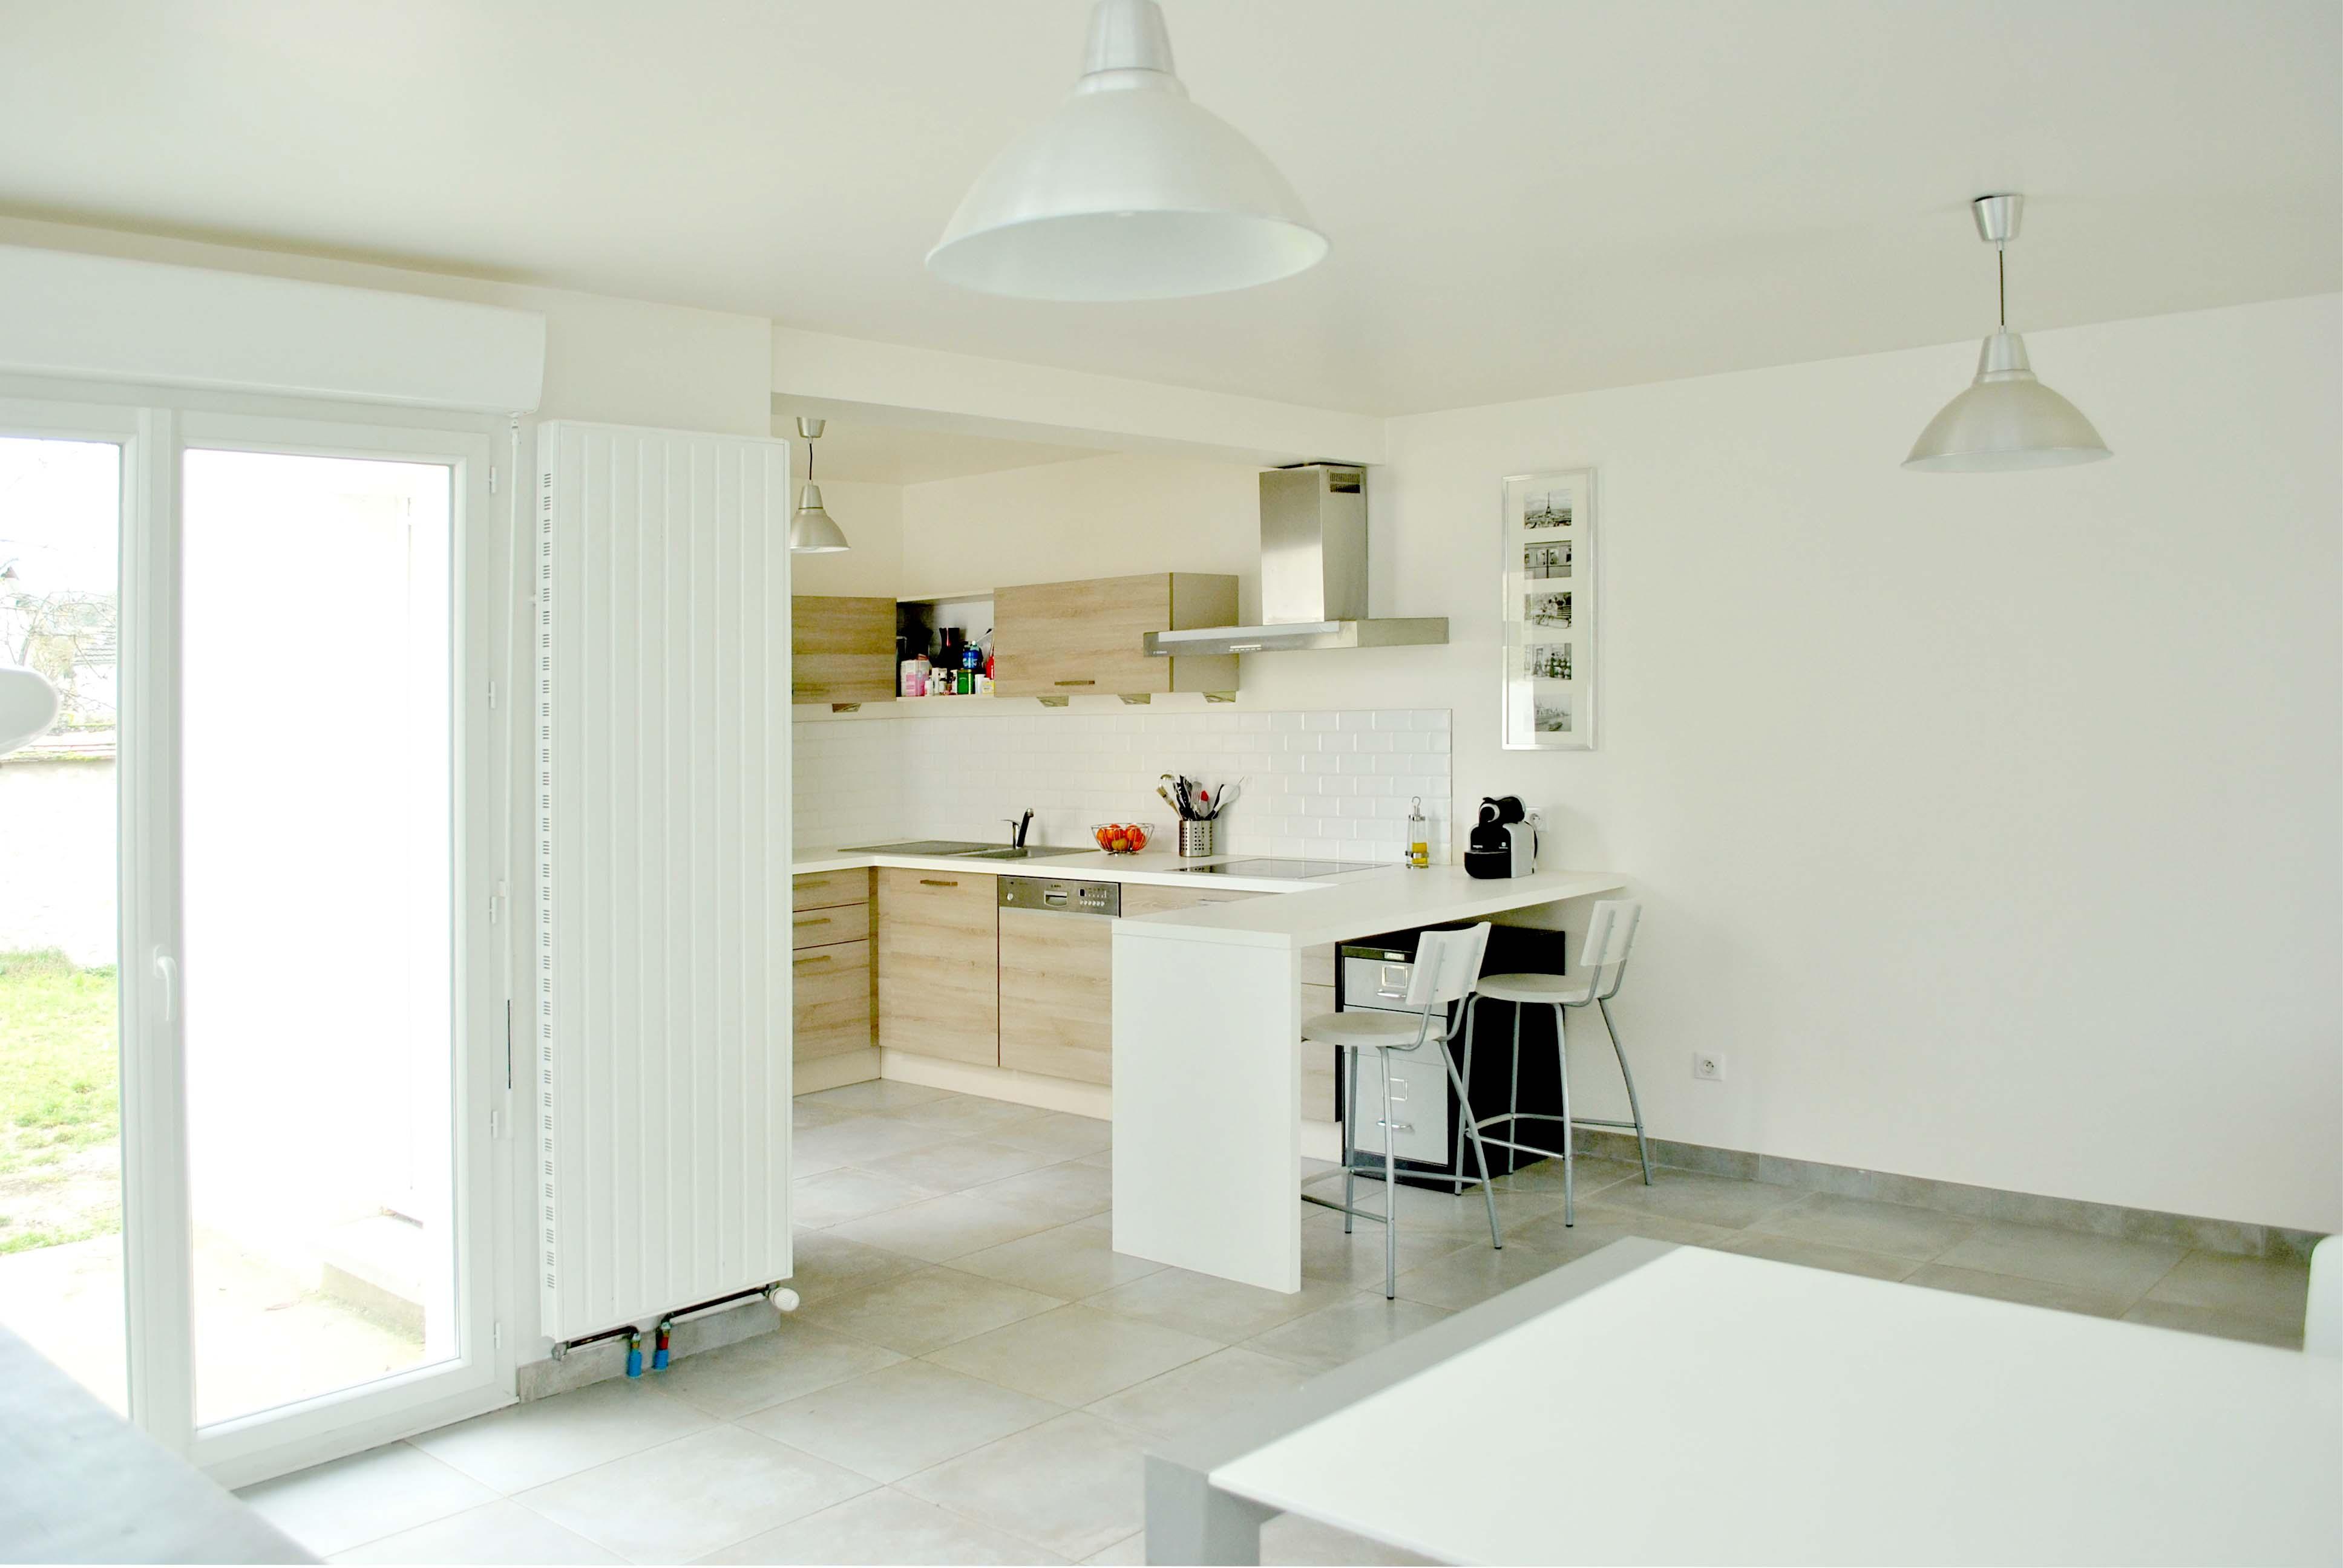 photo 1 interieur extension maison avn1. Black Bedroom Furniture Sets. Home Design Ideas